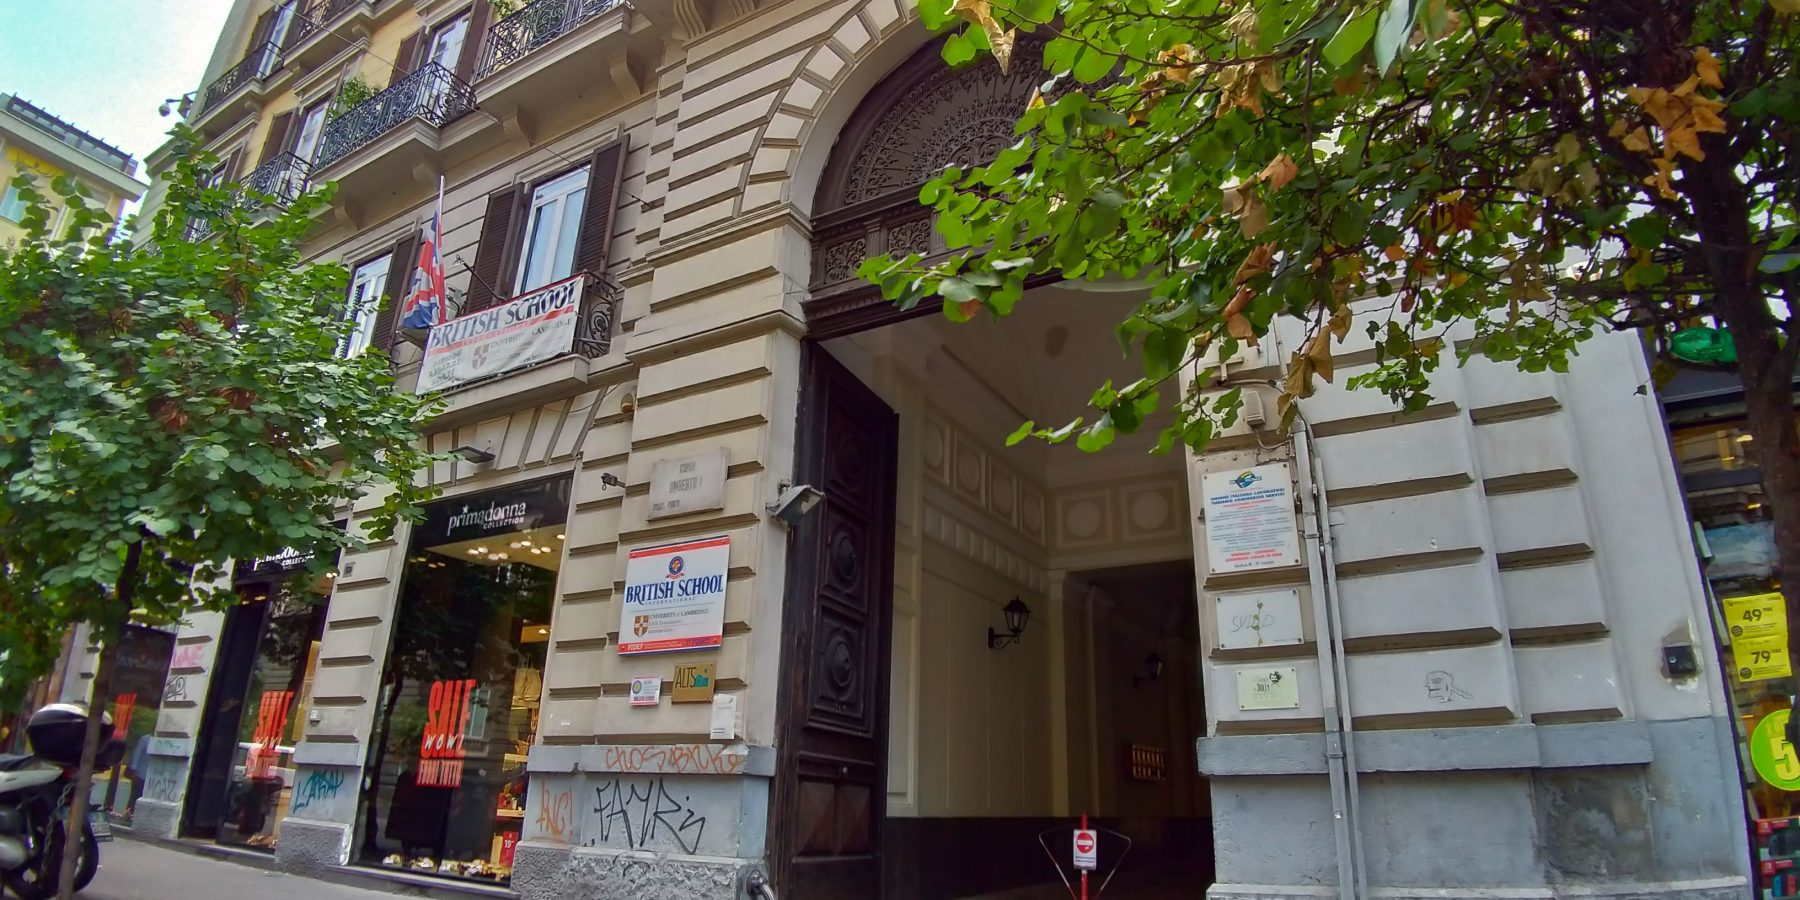 British-Napoli- ISAS Game Academy di Napoli, Corso Umberto I, 35 - Napoli